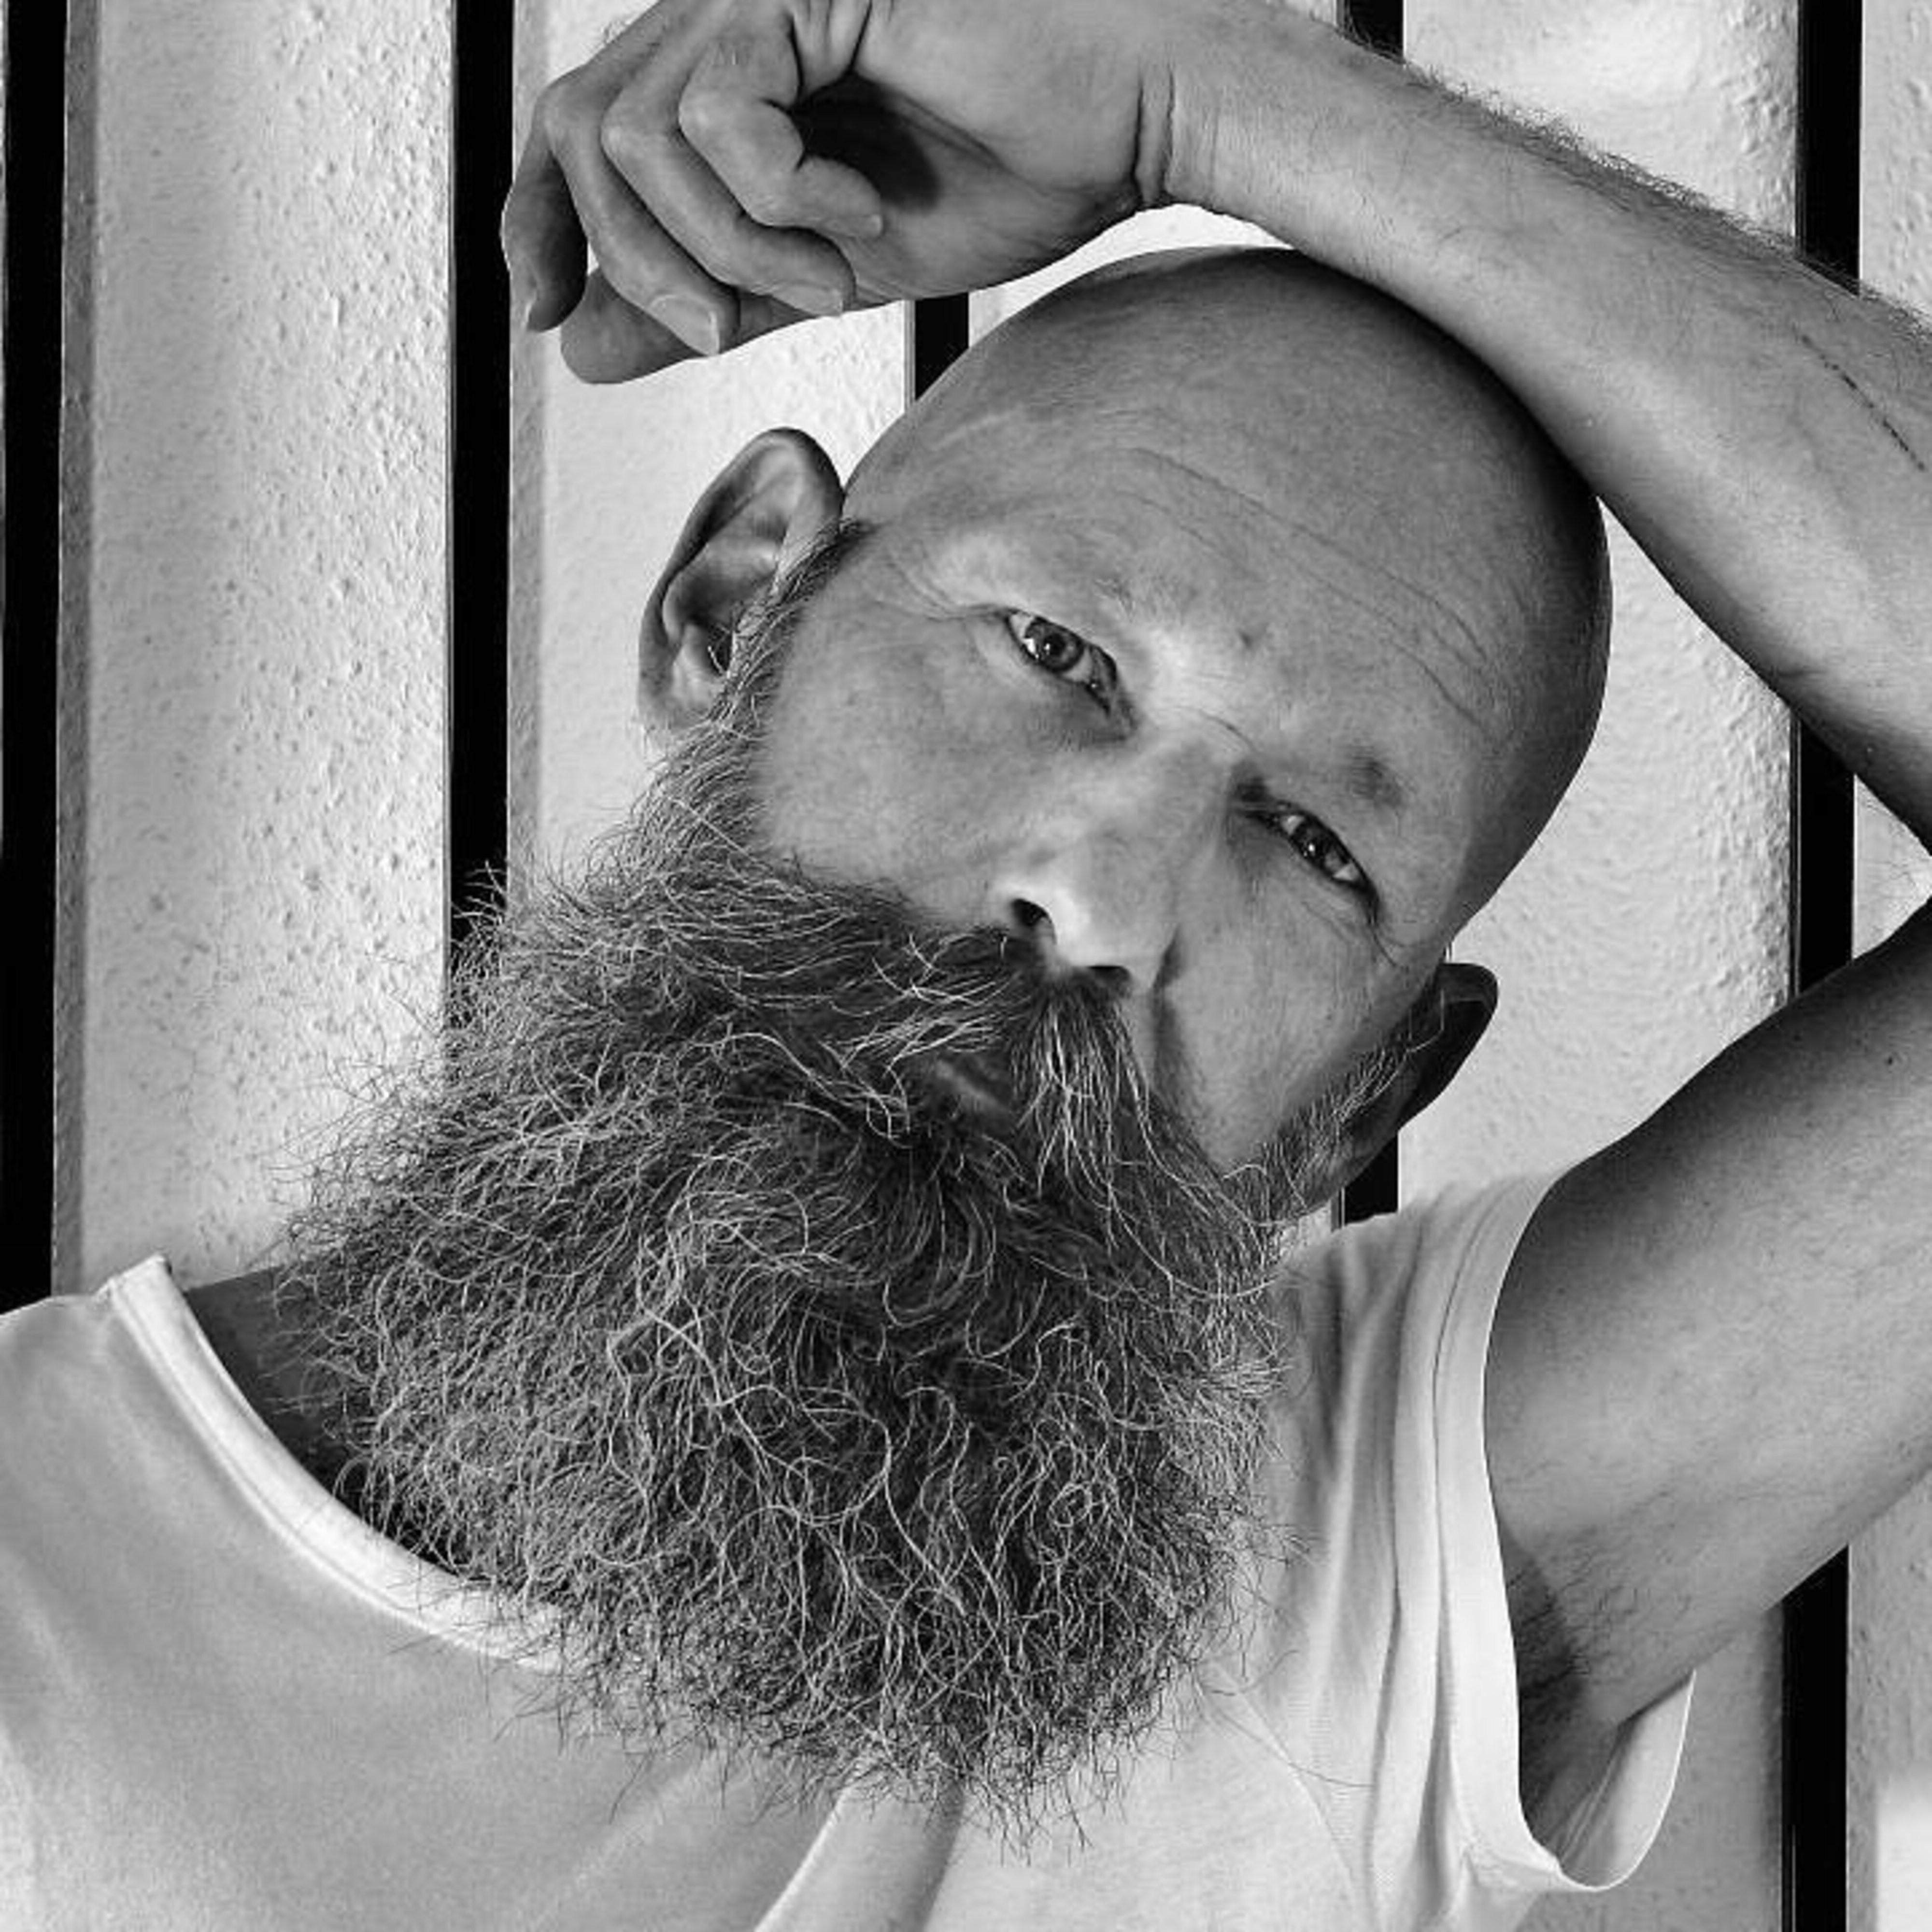 A long beard for the bald men.